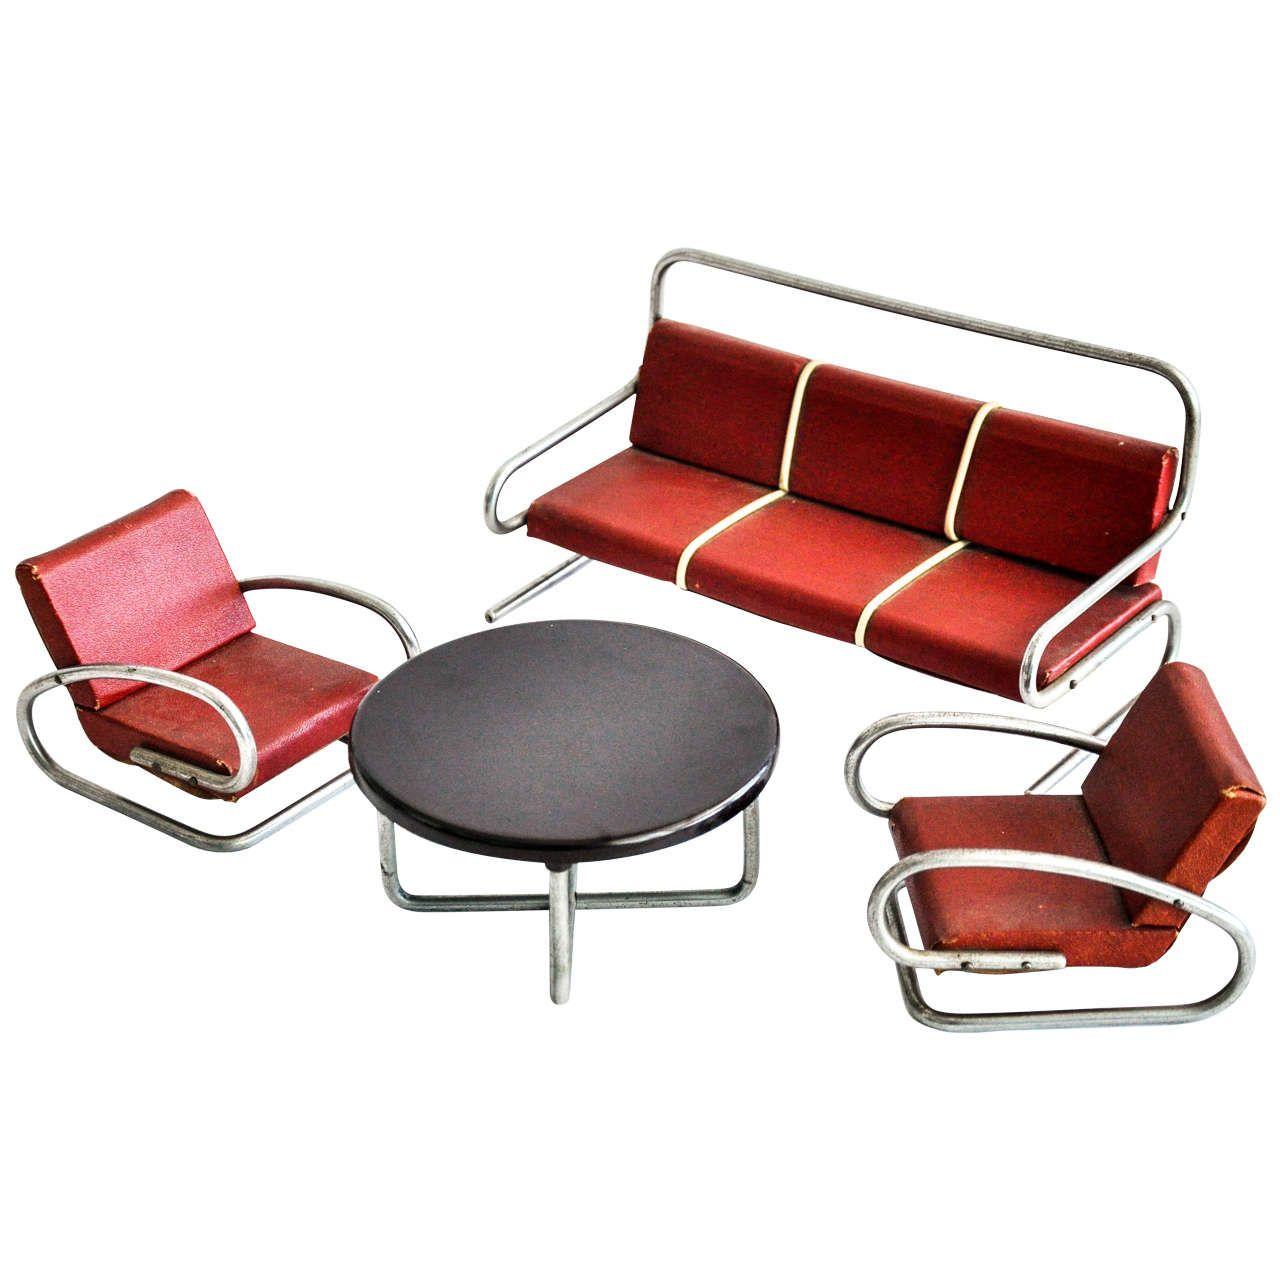 Bauhaus tubular steel lounge chair at 1stdibs - For Sale On A Four Piece Set Of Miniature Tubular Furniture Attributed To The Czech Designer Jindrich Halabala Halabala Was A Modernist Czech Furniture